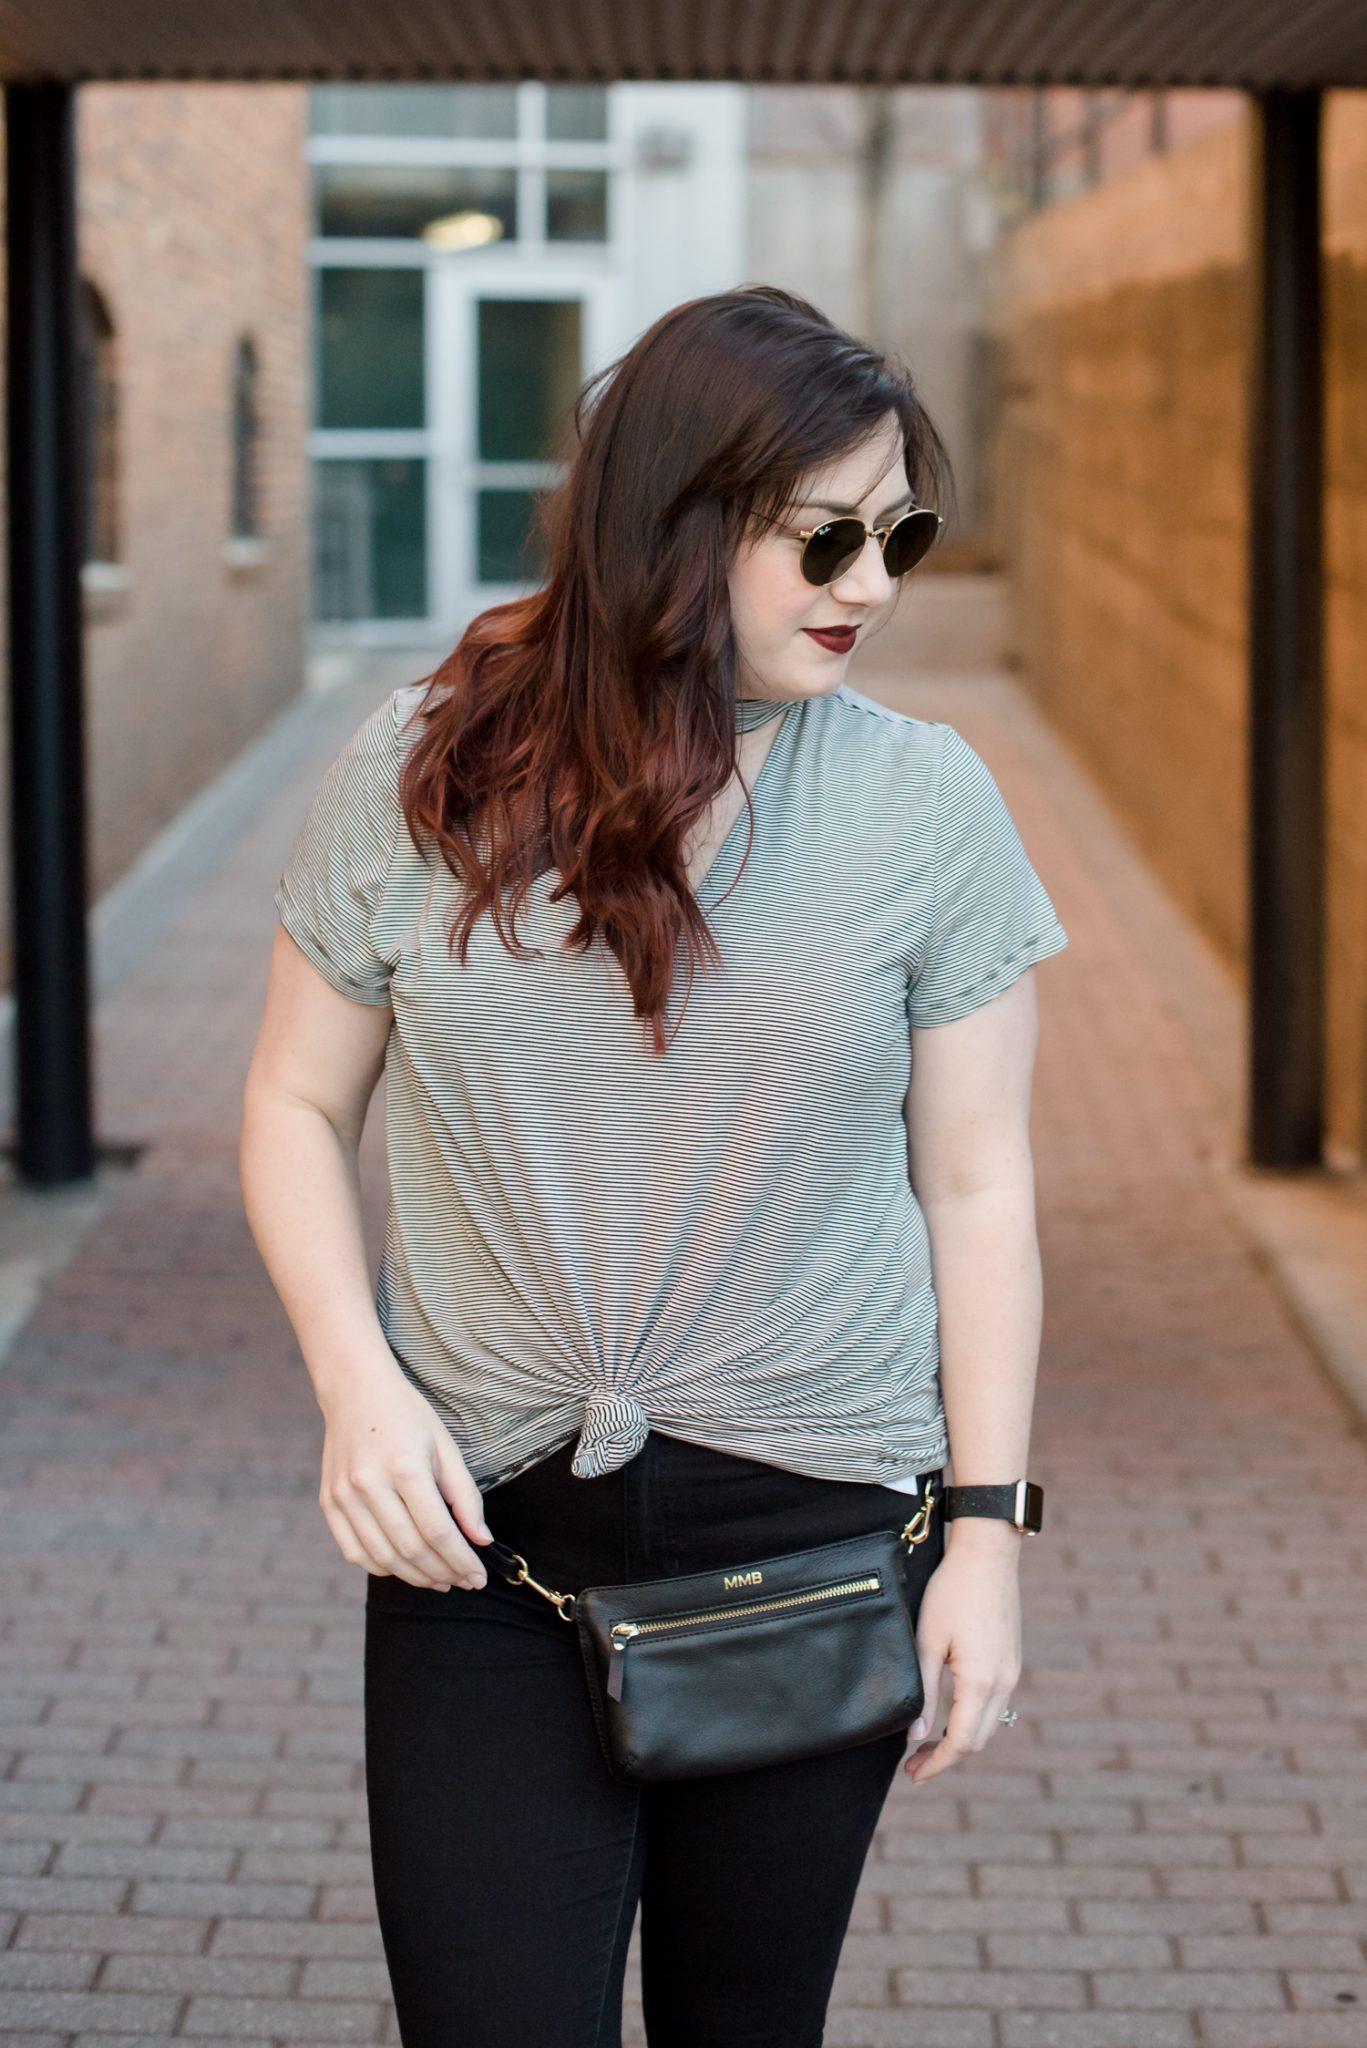 Concert Style: A Choker Tee with a Belt Bag via @missmollymoon